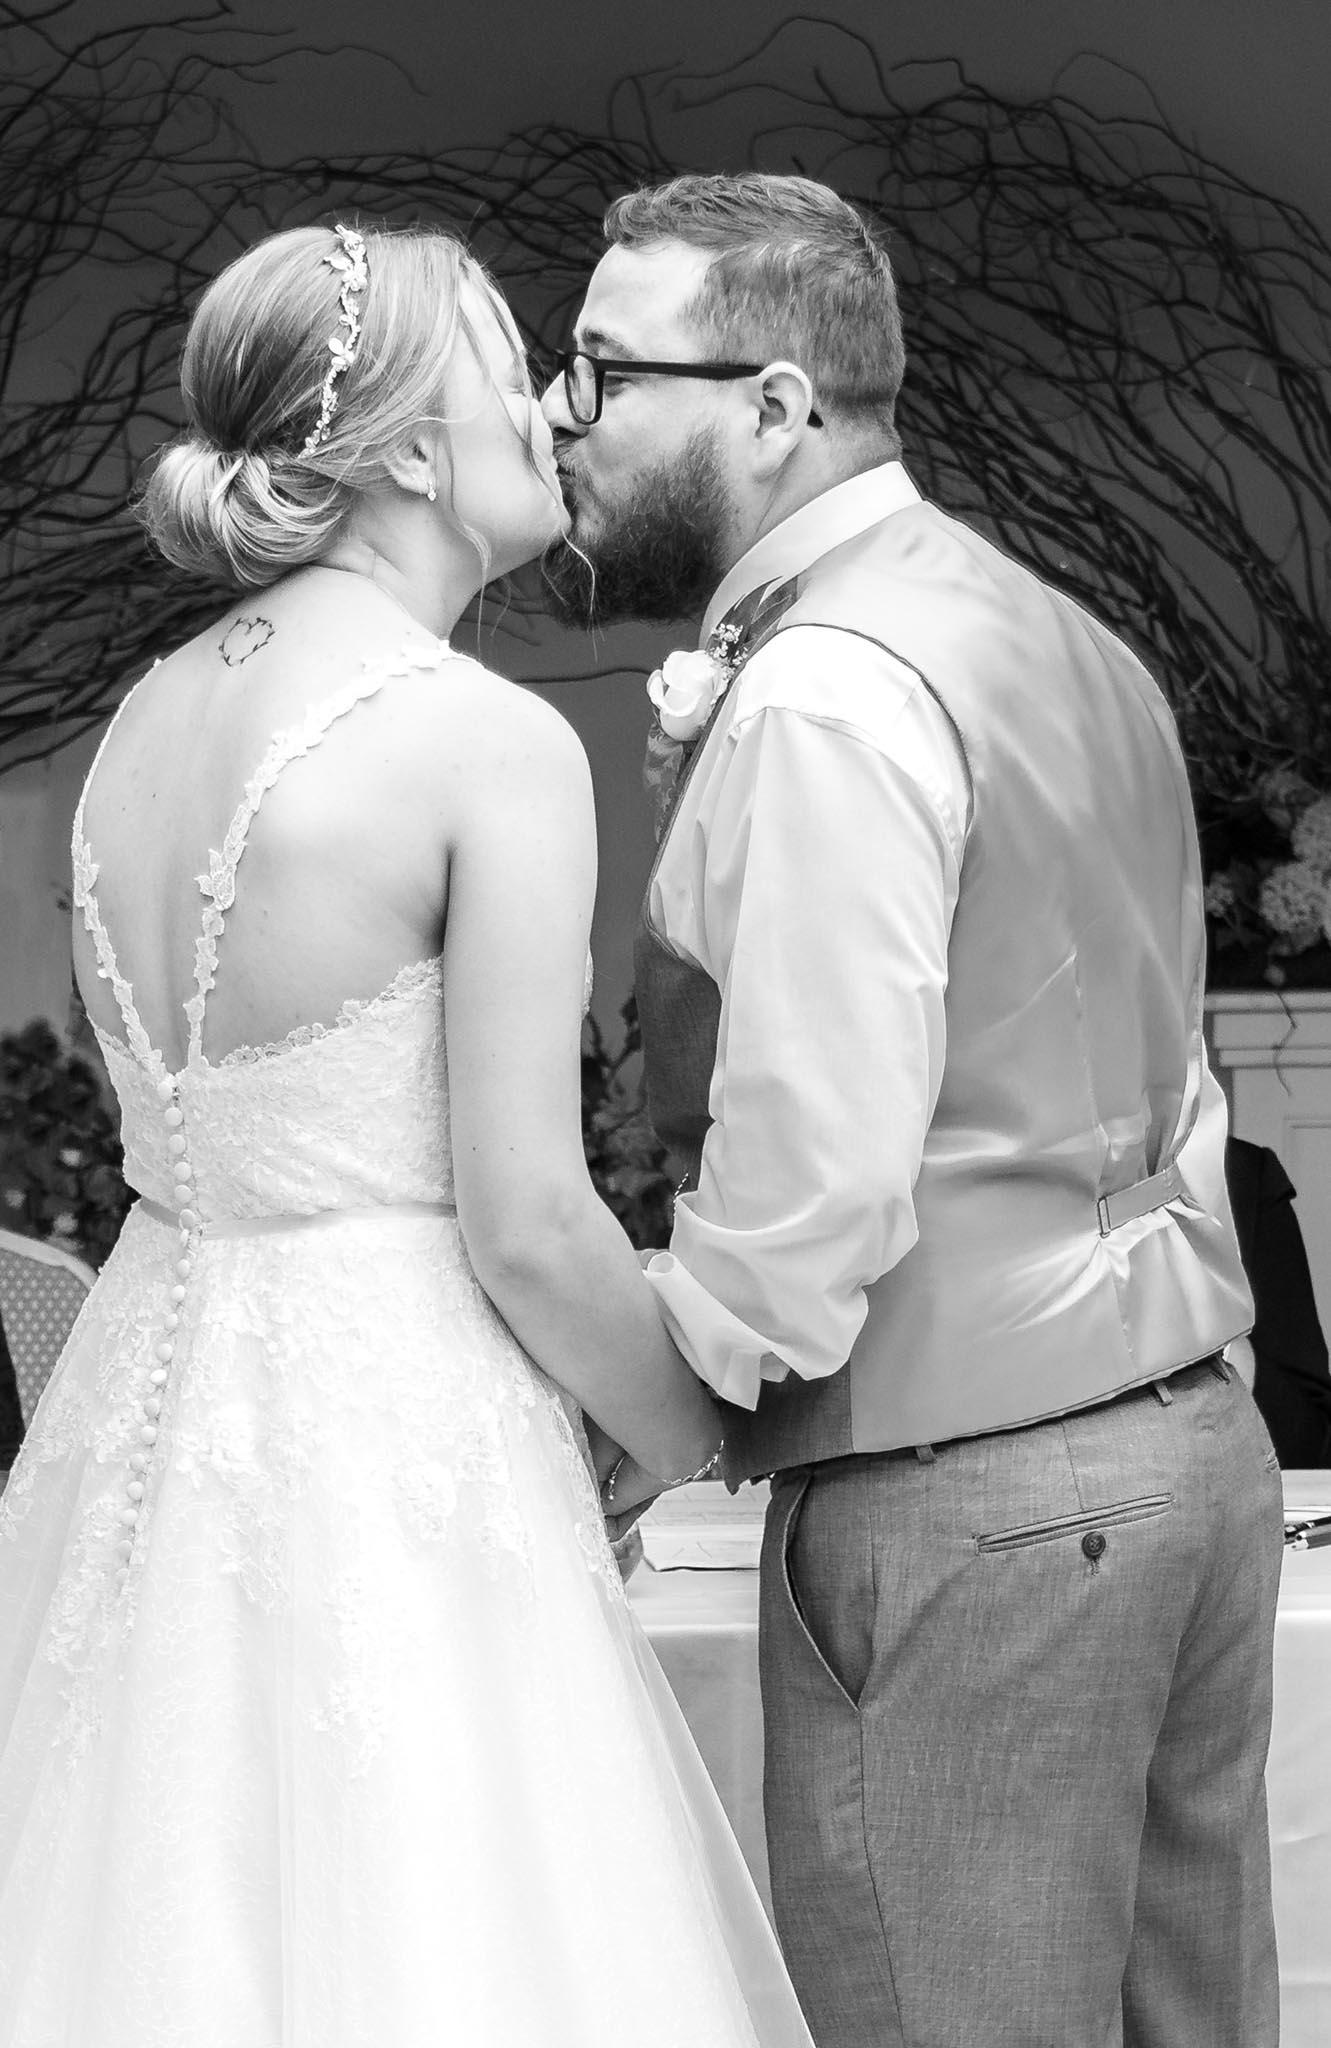 435-Ceremony-Luke-Yasmin-The-Rayleigh-Club-Wedding-Photography.jpg